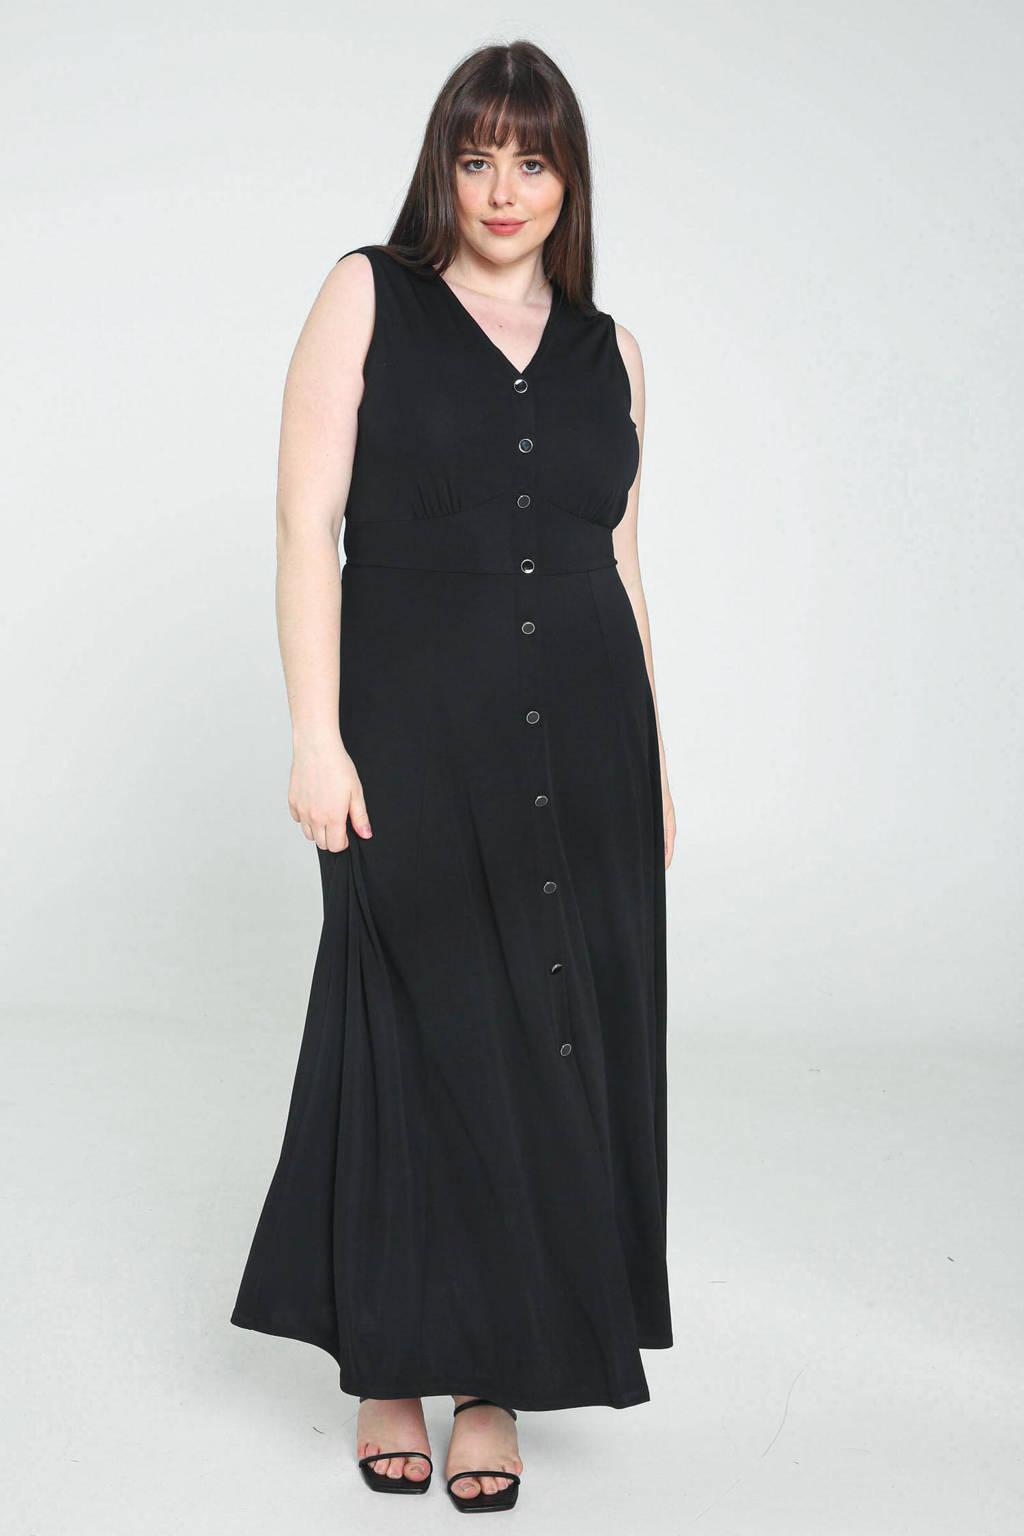 PROMISS jurk met plooien zwart, Zwart